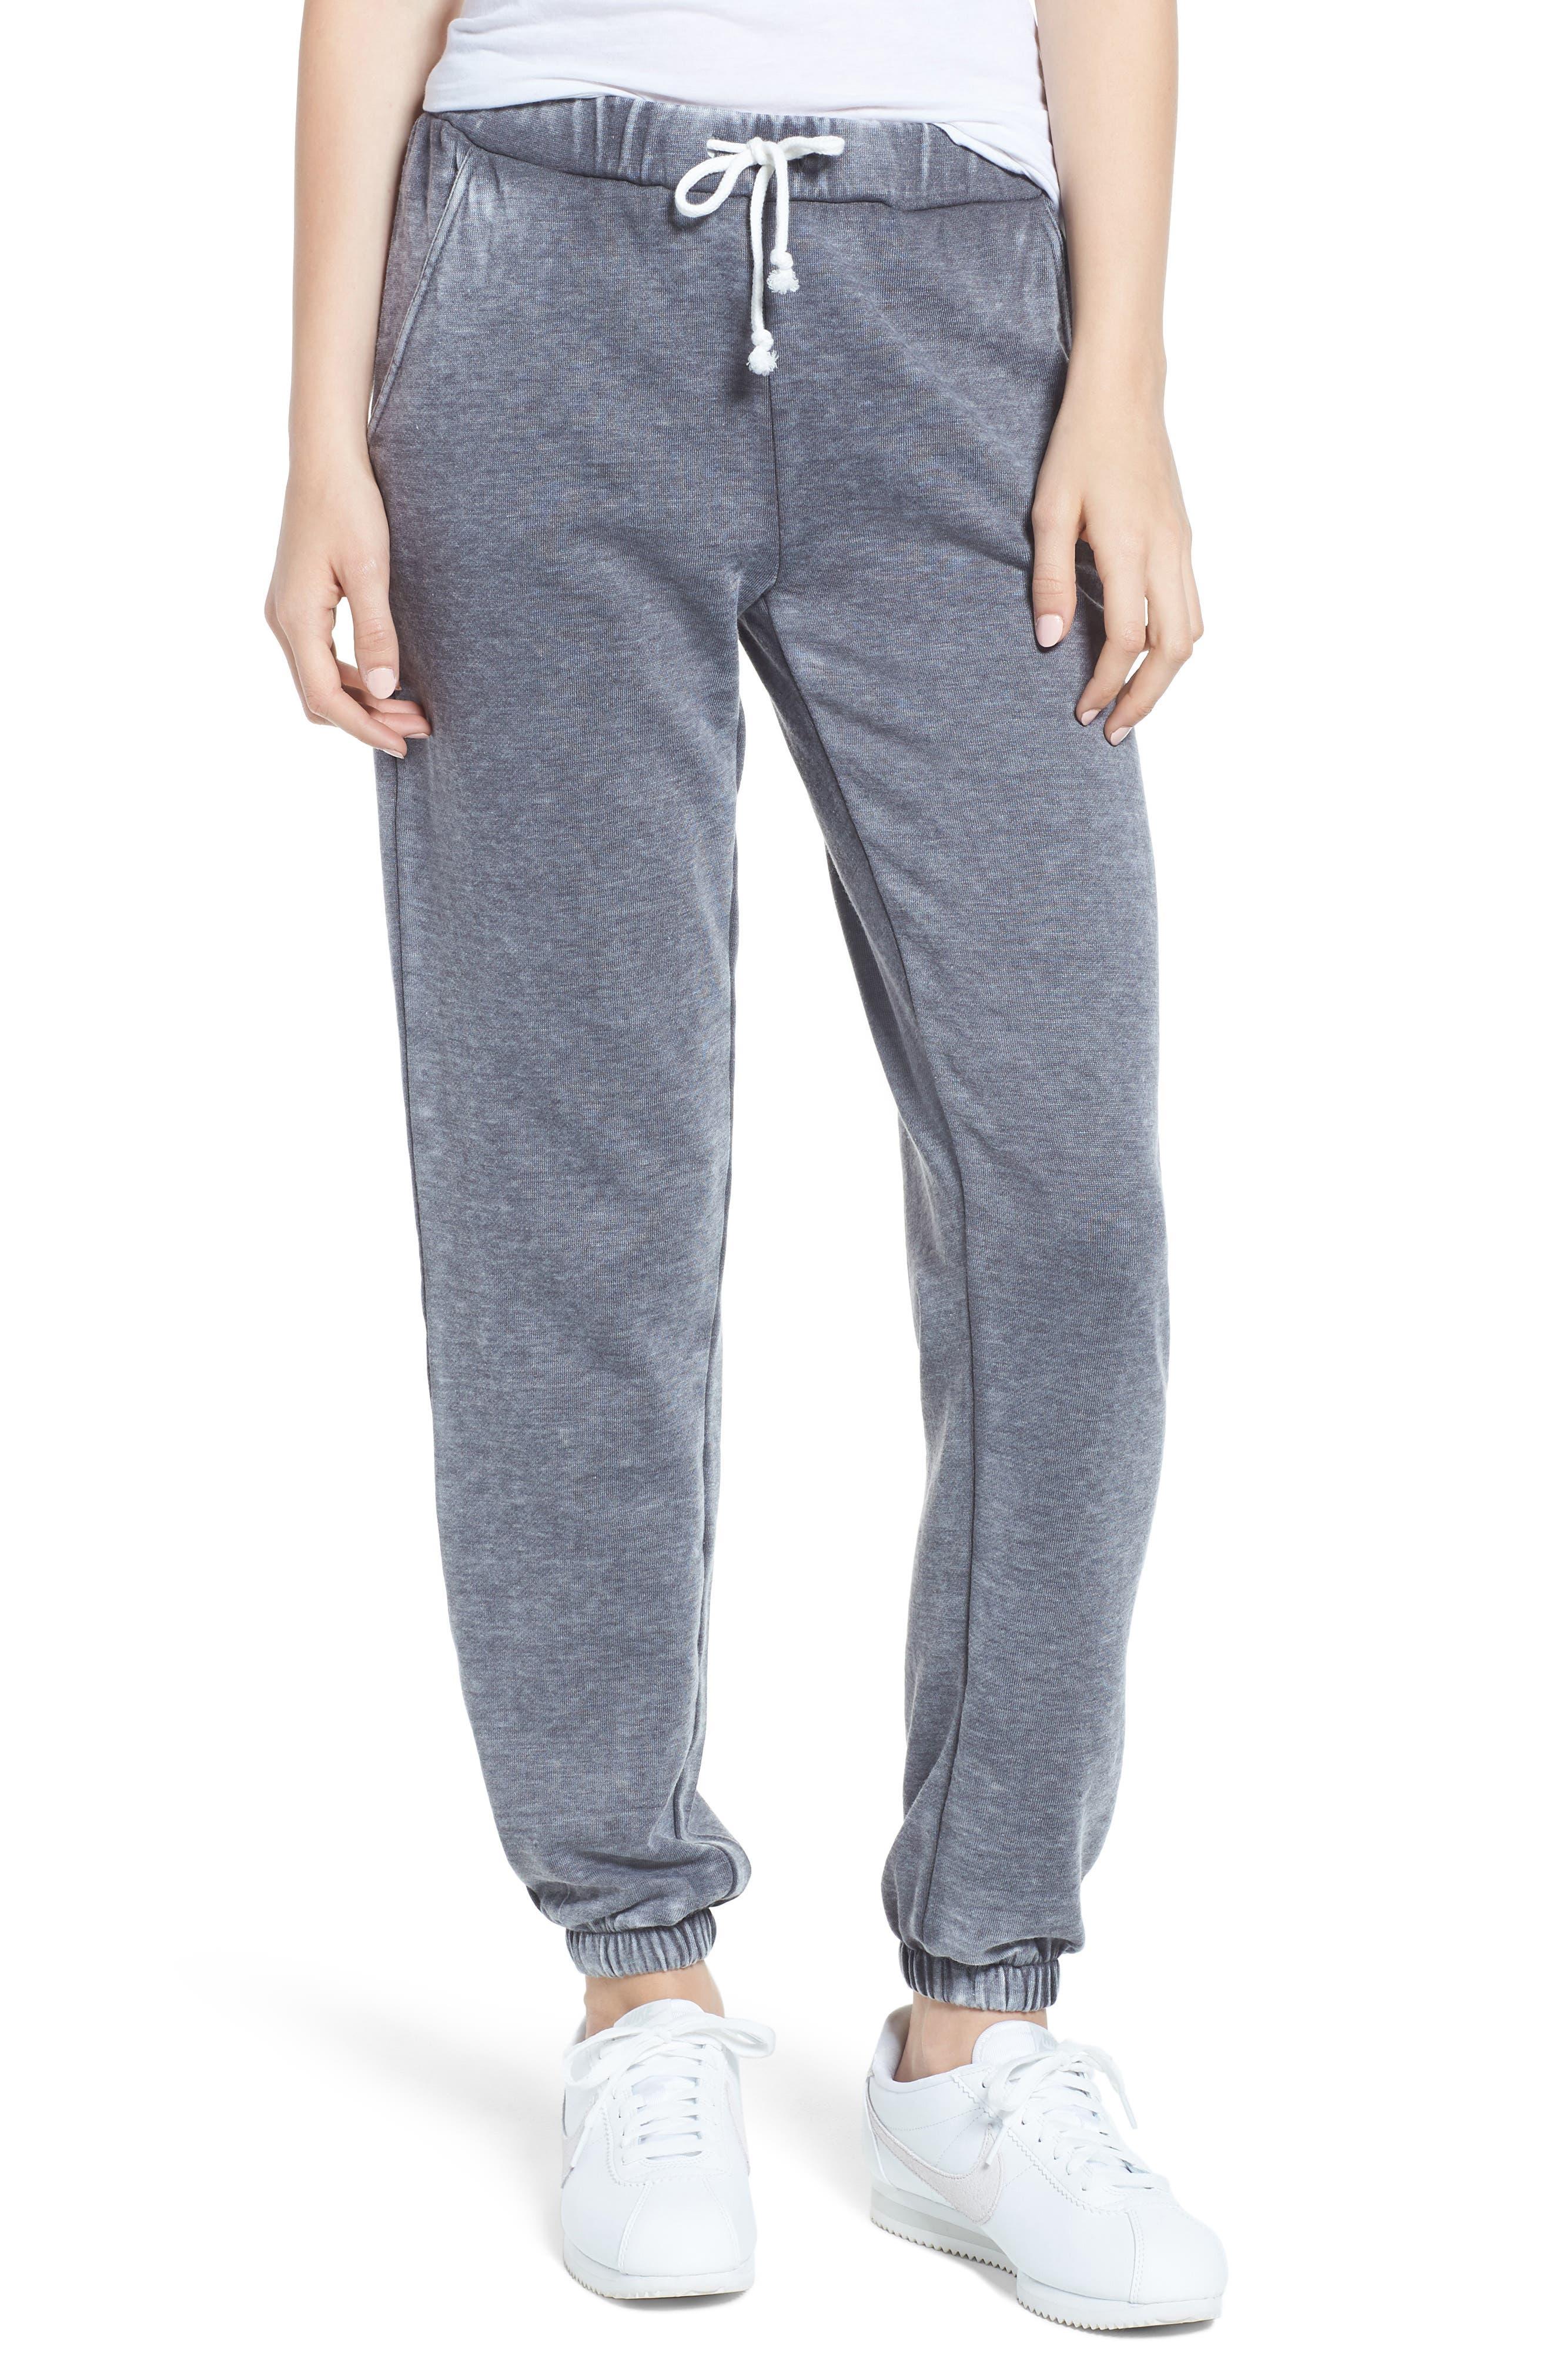 Riya Fashion Fleece Sweatpants,                         Main,                         color, 020